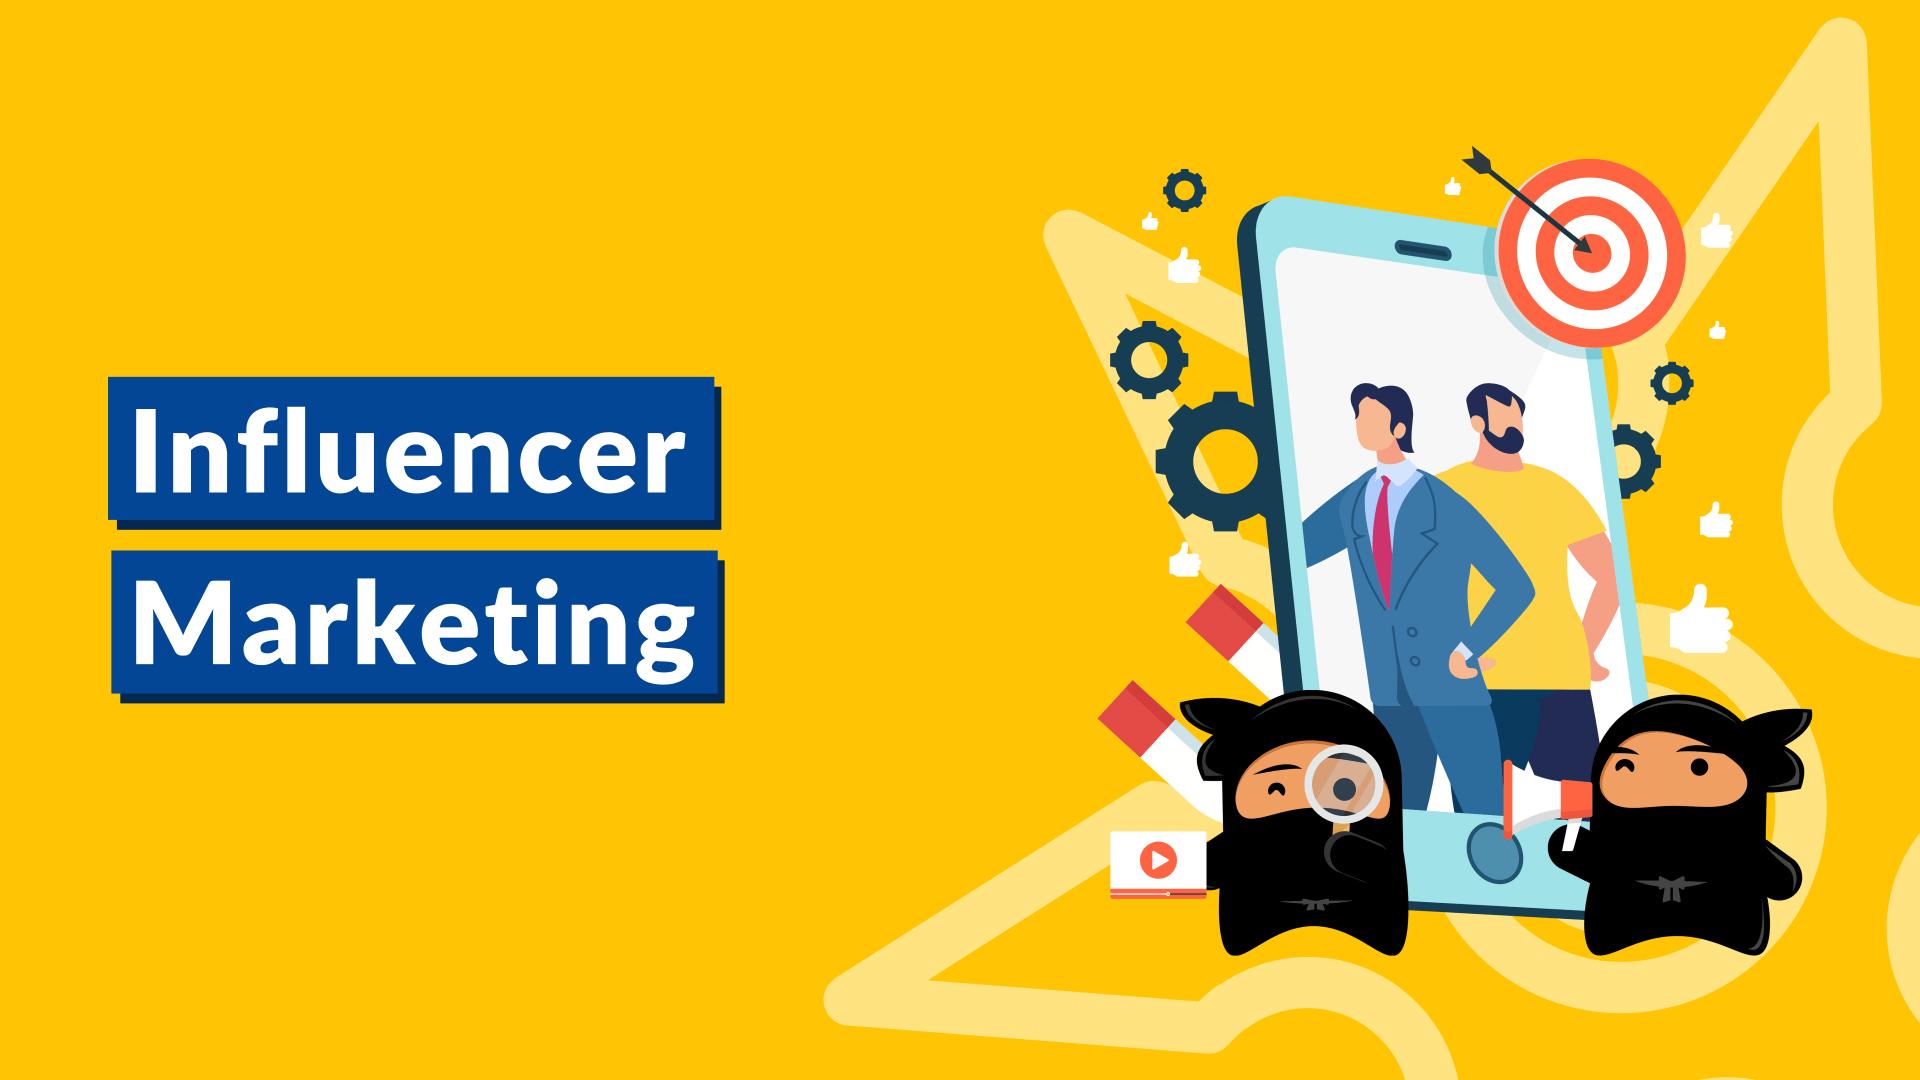 Influencer Marketing: A New Winning Strategy